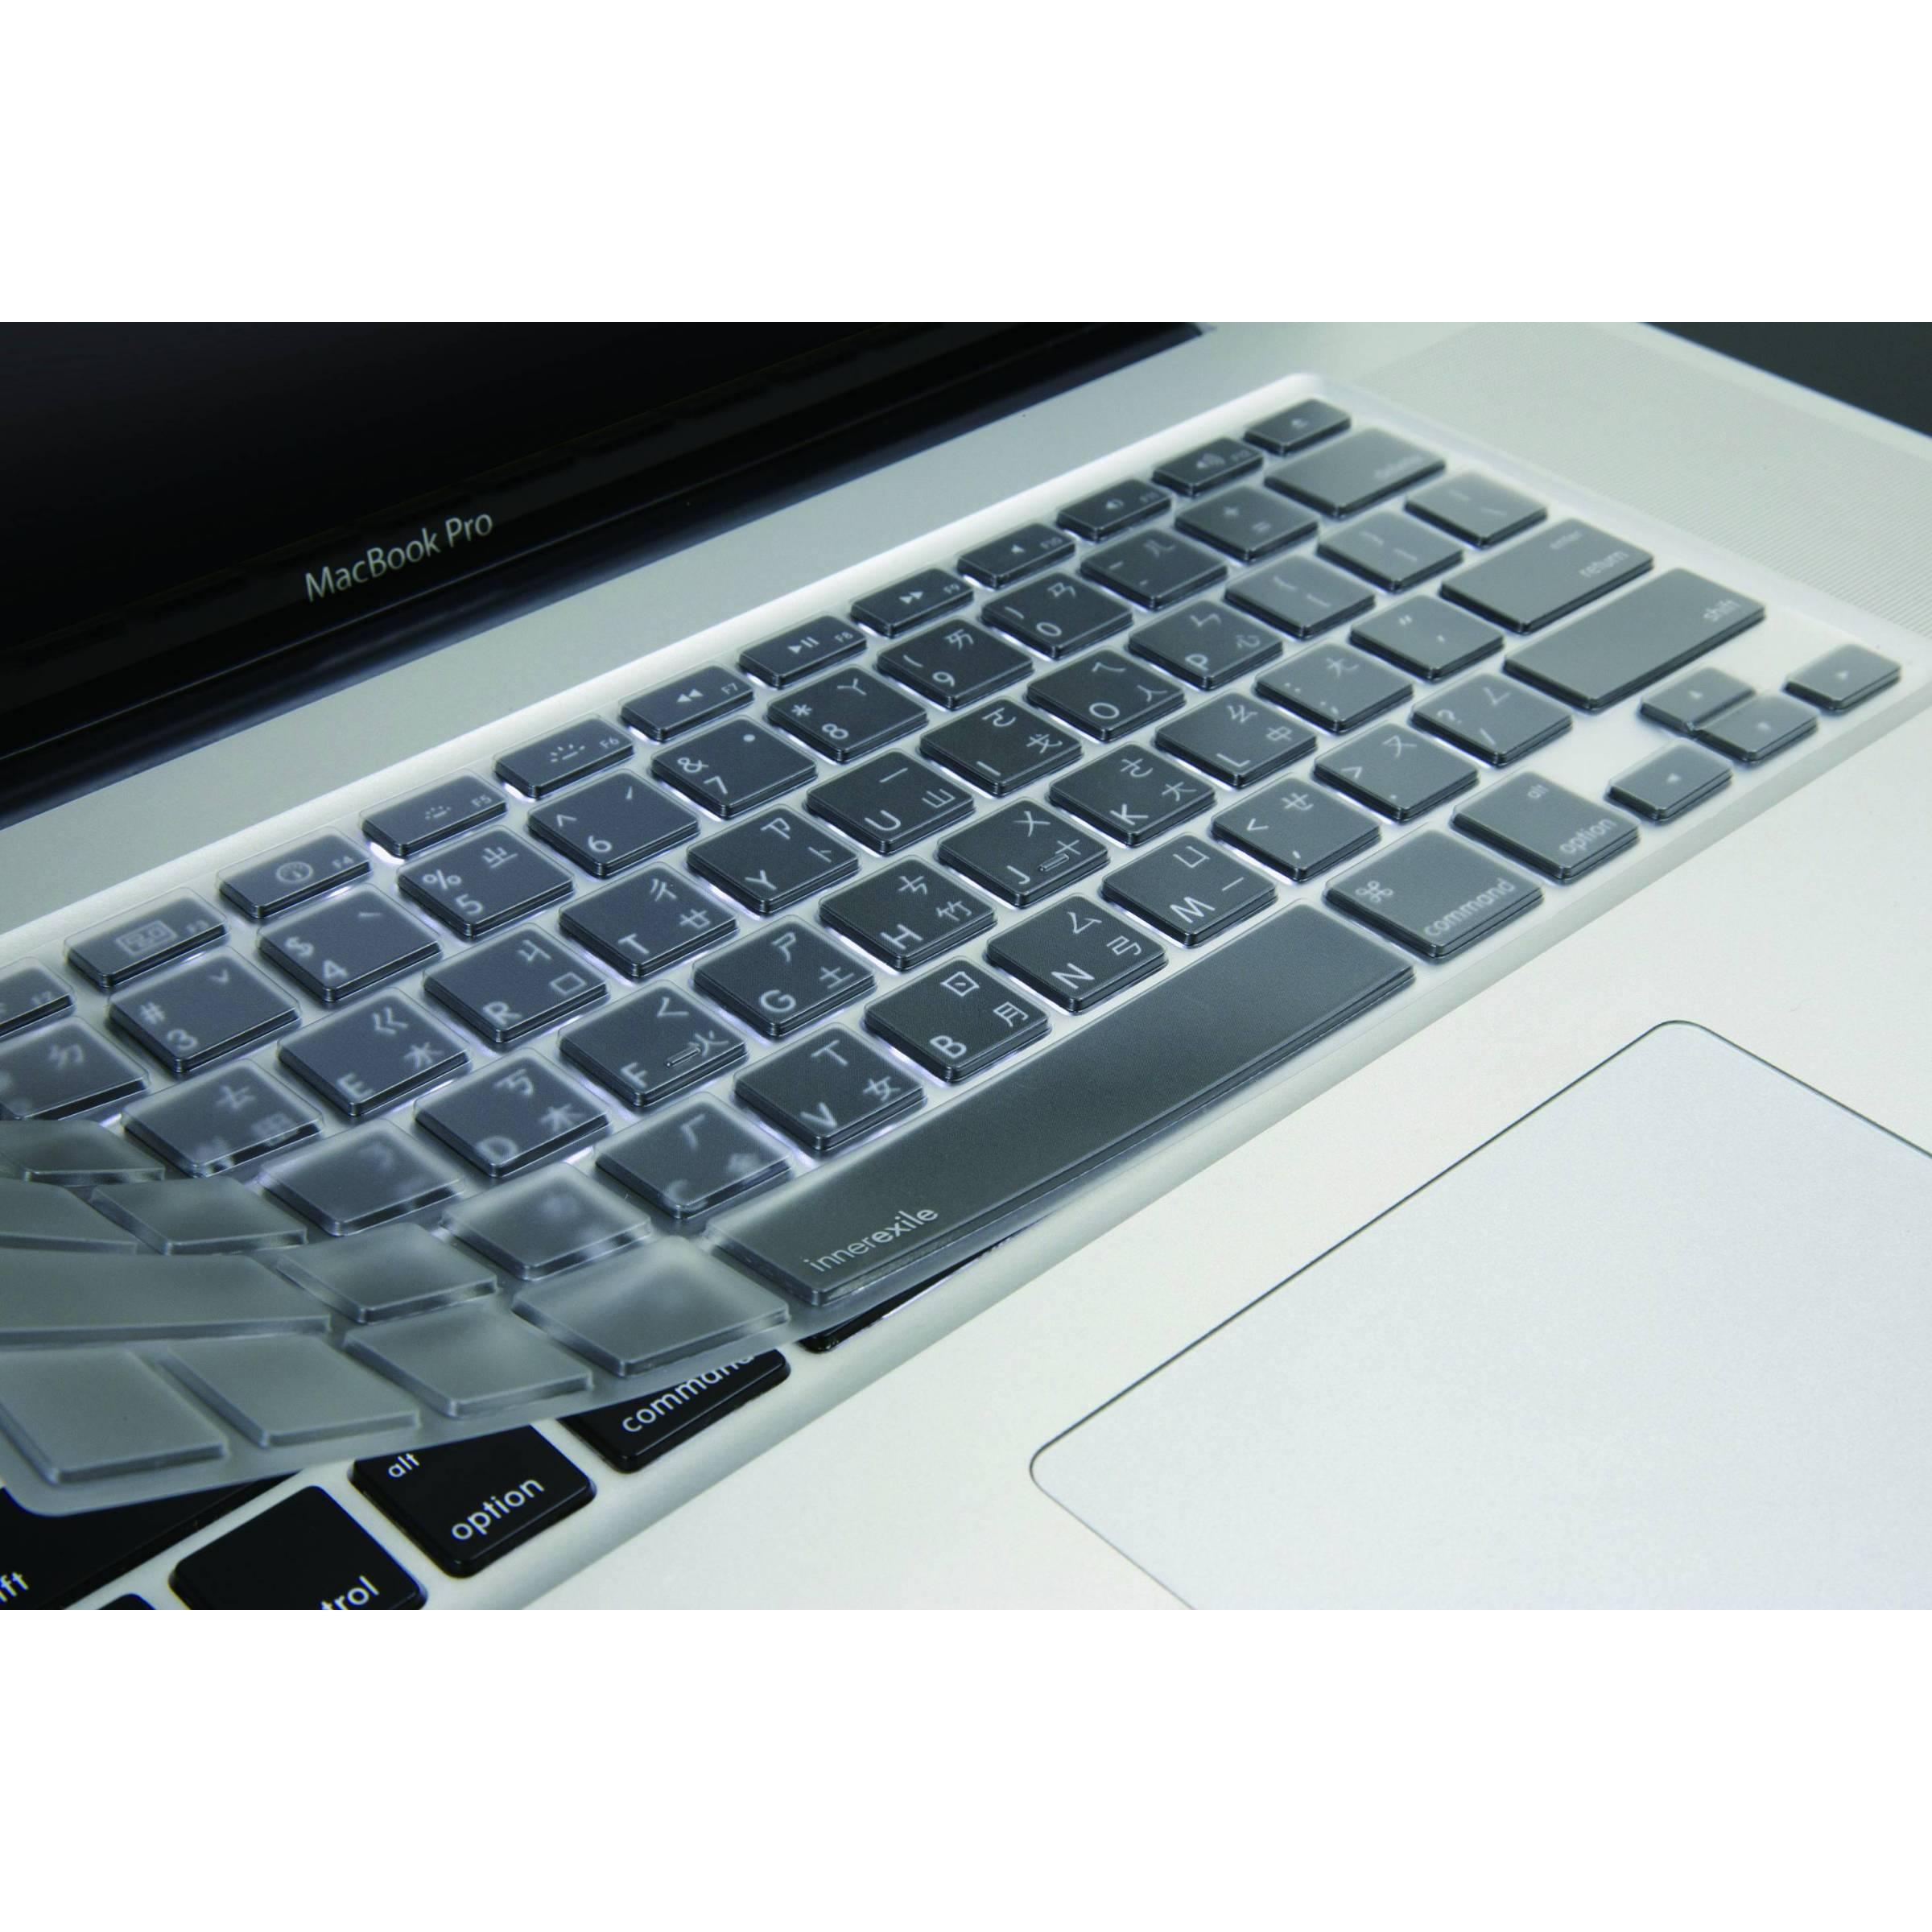 innerexile – Innerexile lucid beskyttelse til dit tastatur på mackabler.dk